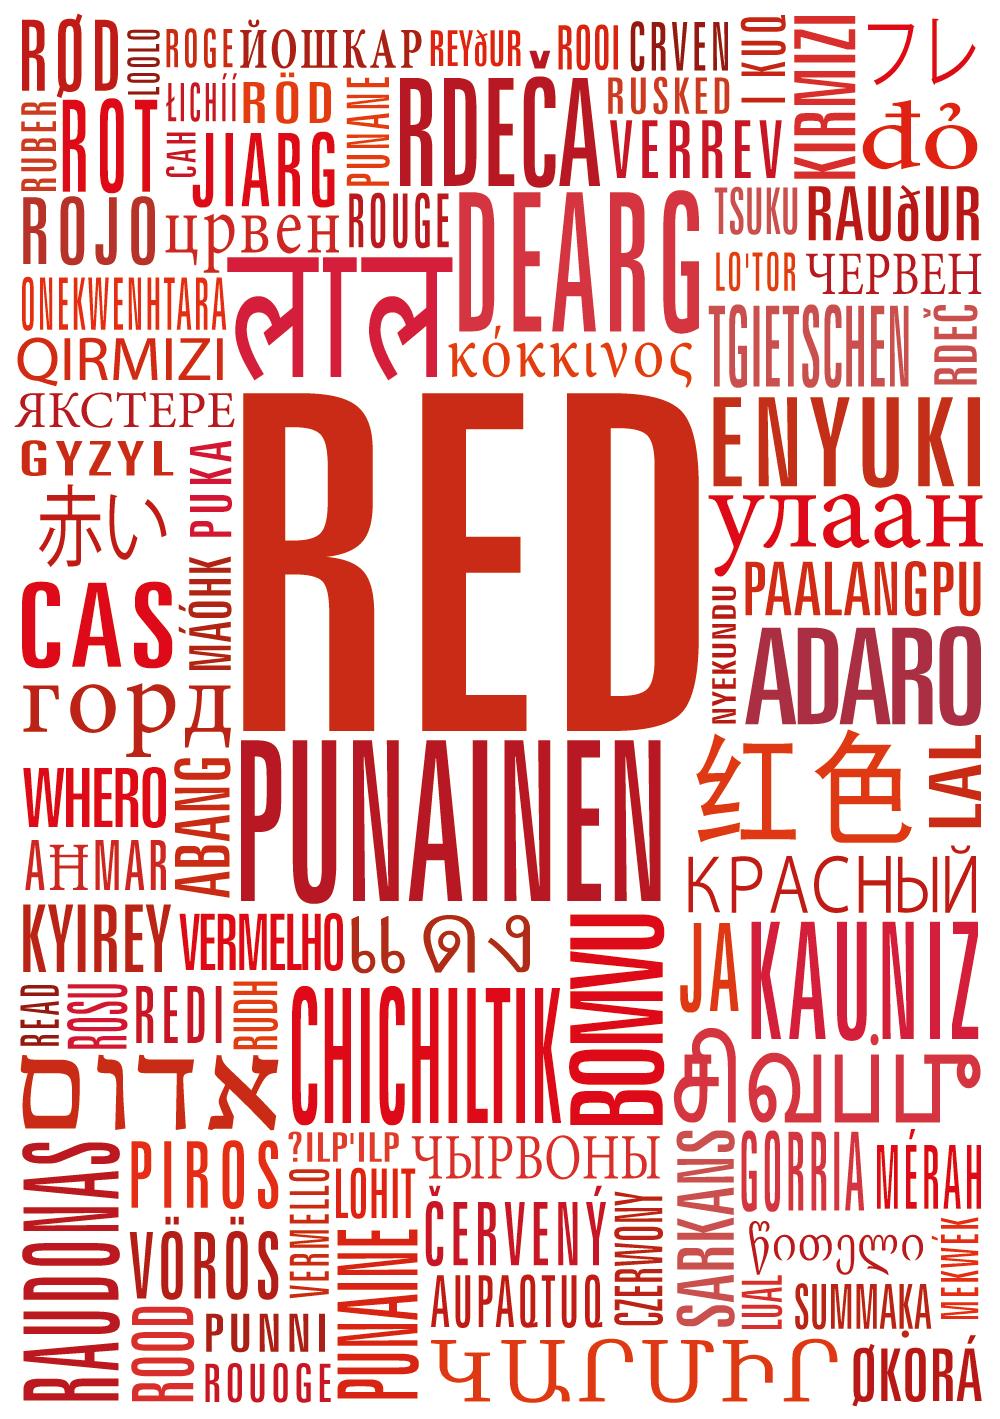 coloria punaista eri kielin